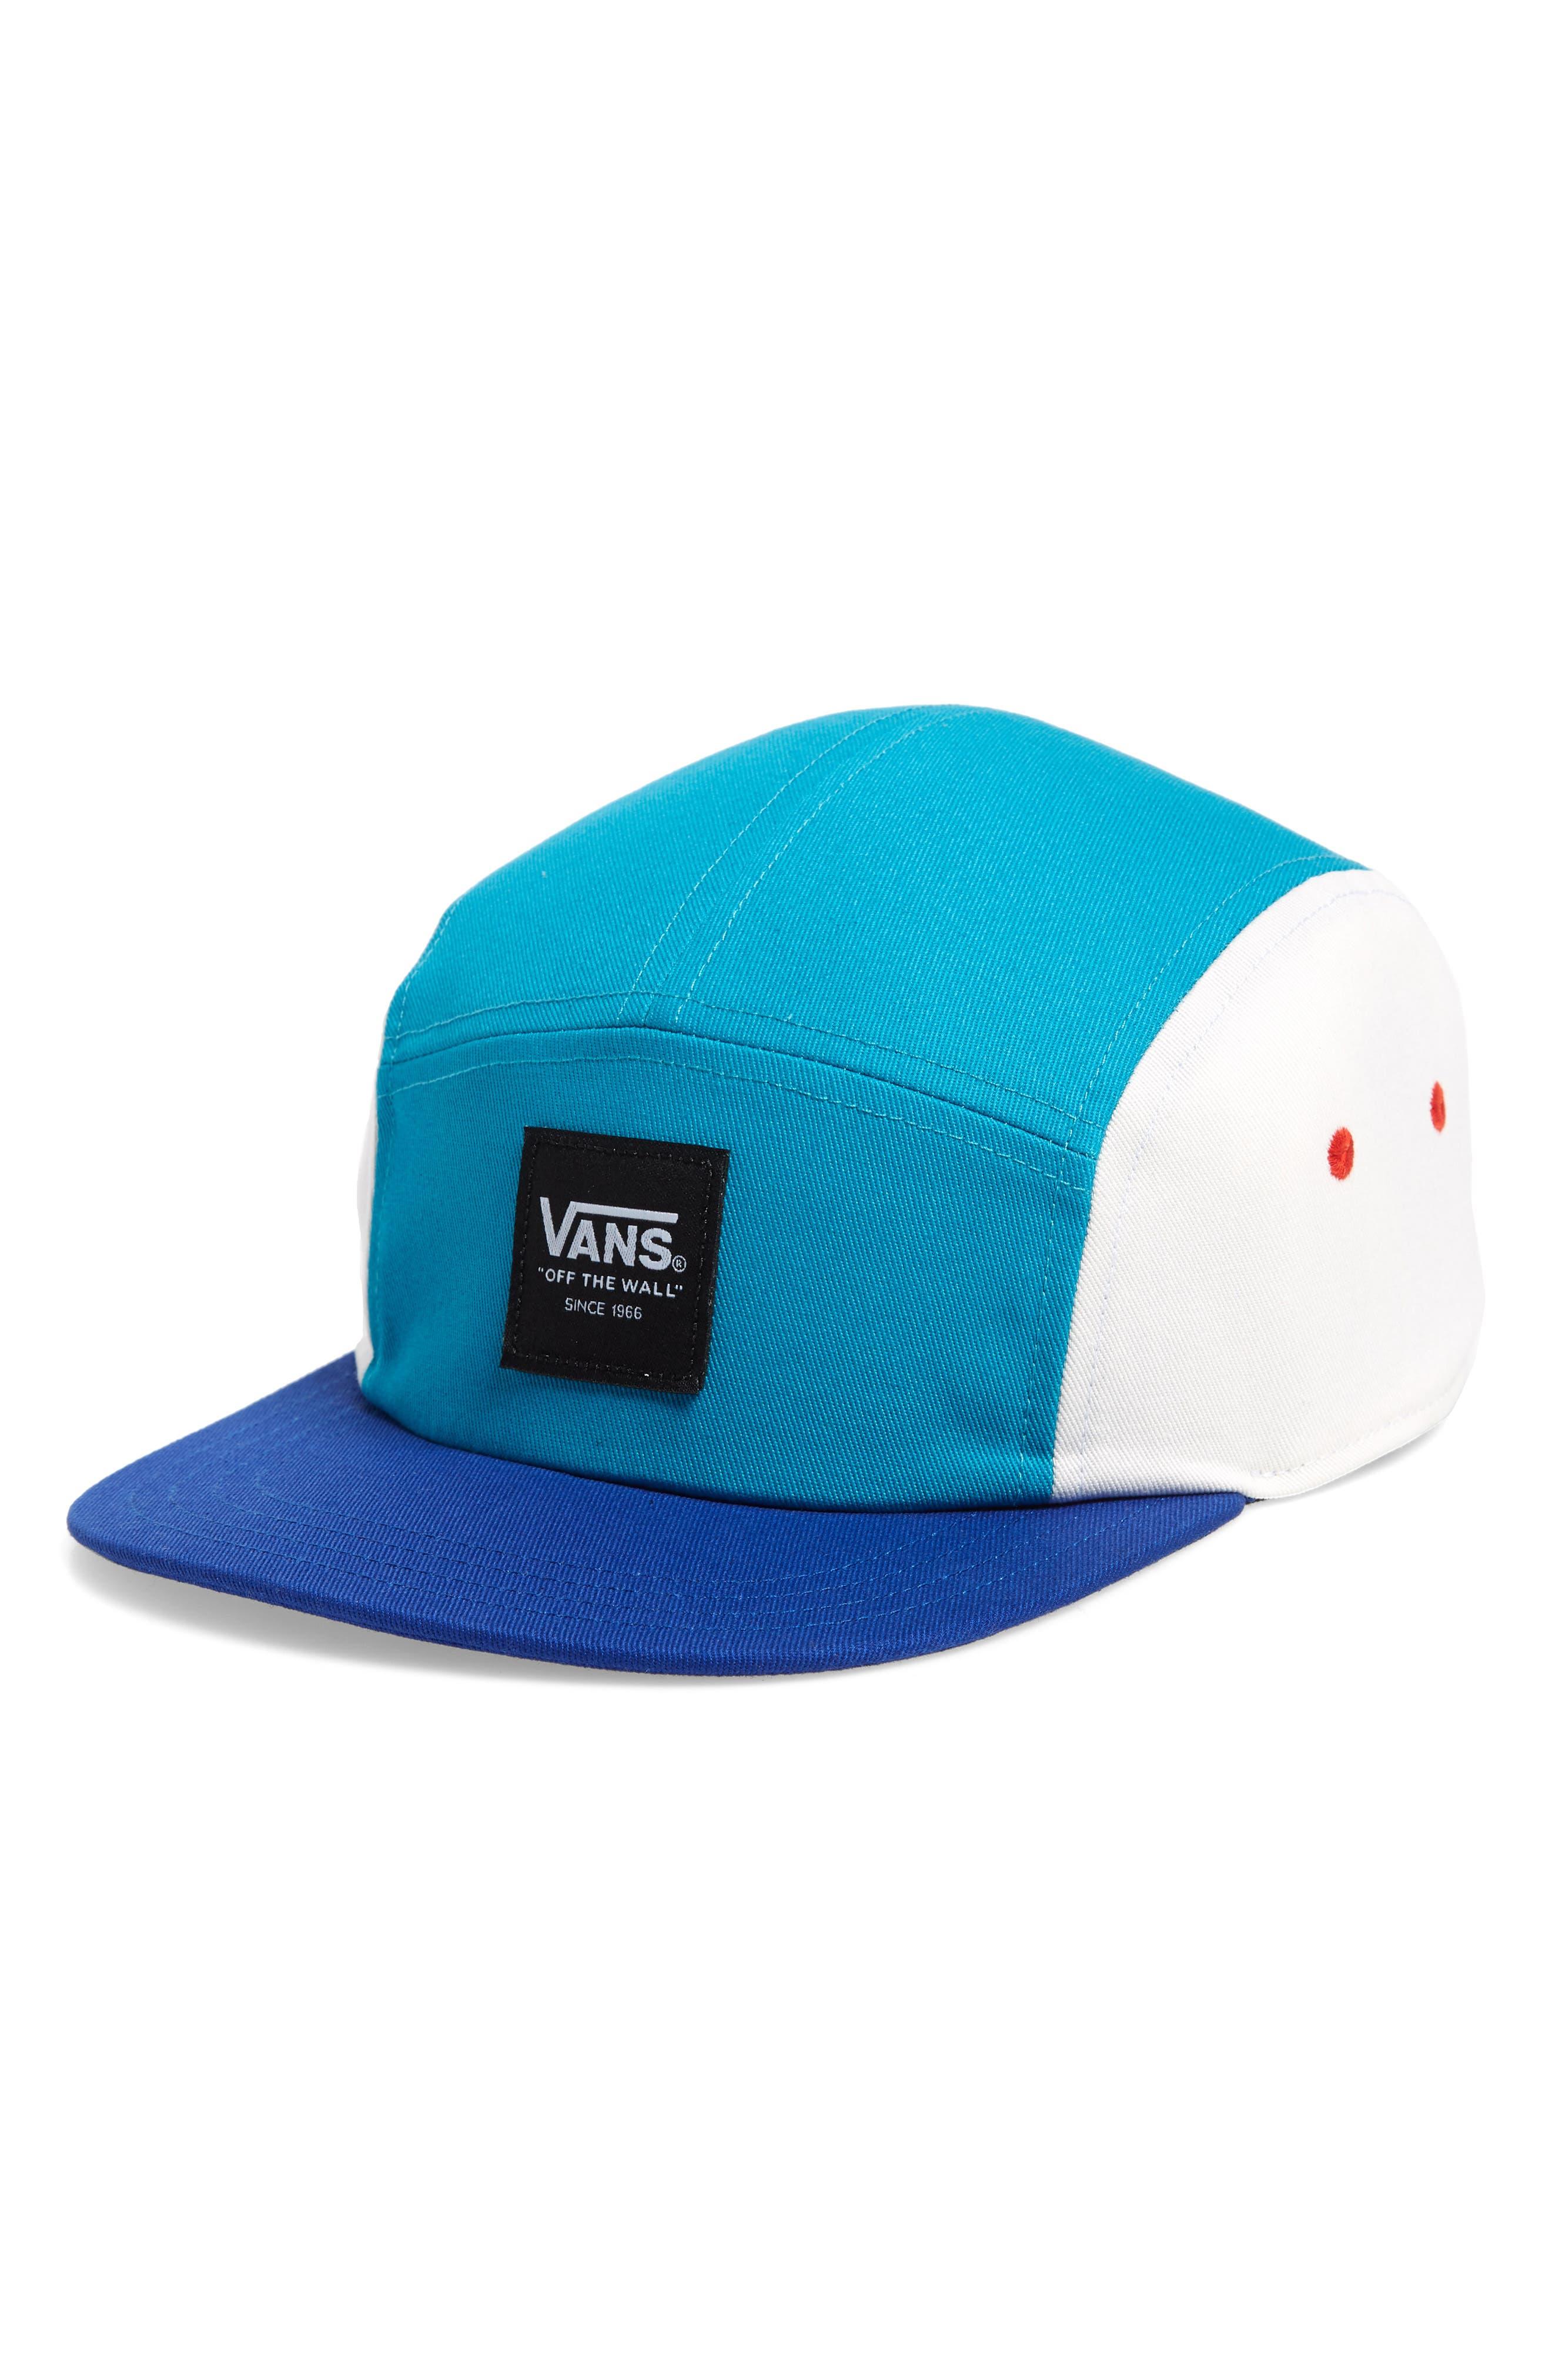 Ranger Five Panel Camper Hat,                             Main thumbnail 1, color,                             MAZARINE BLUE